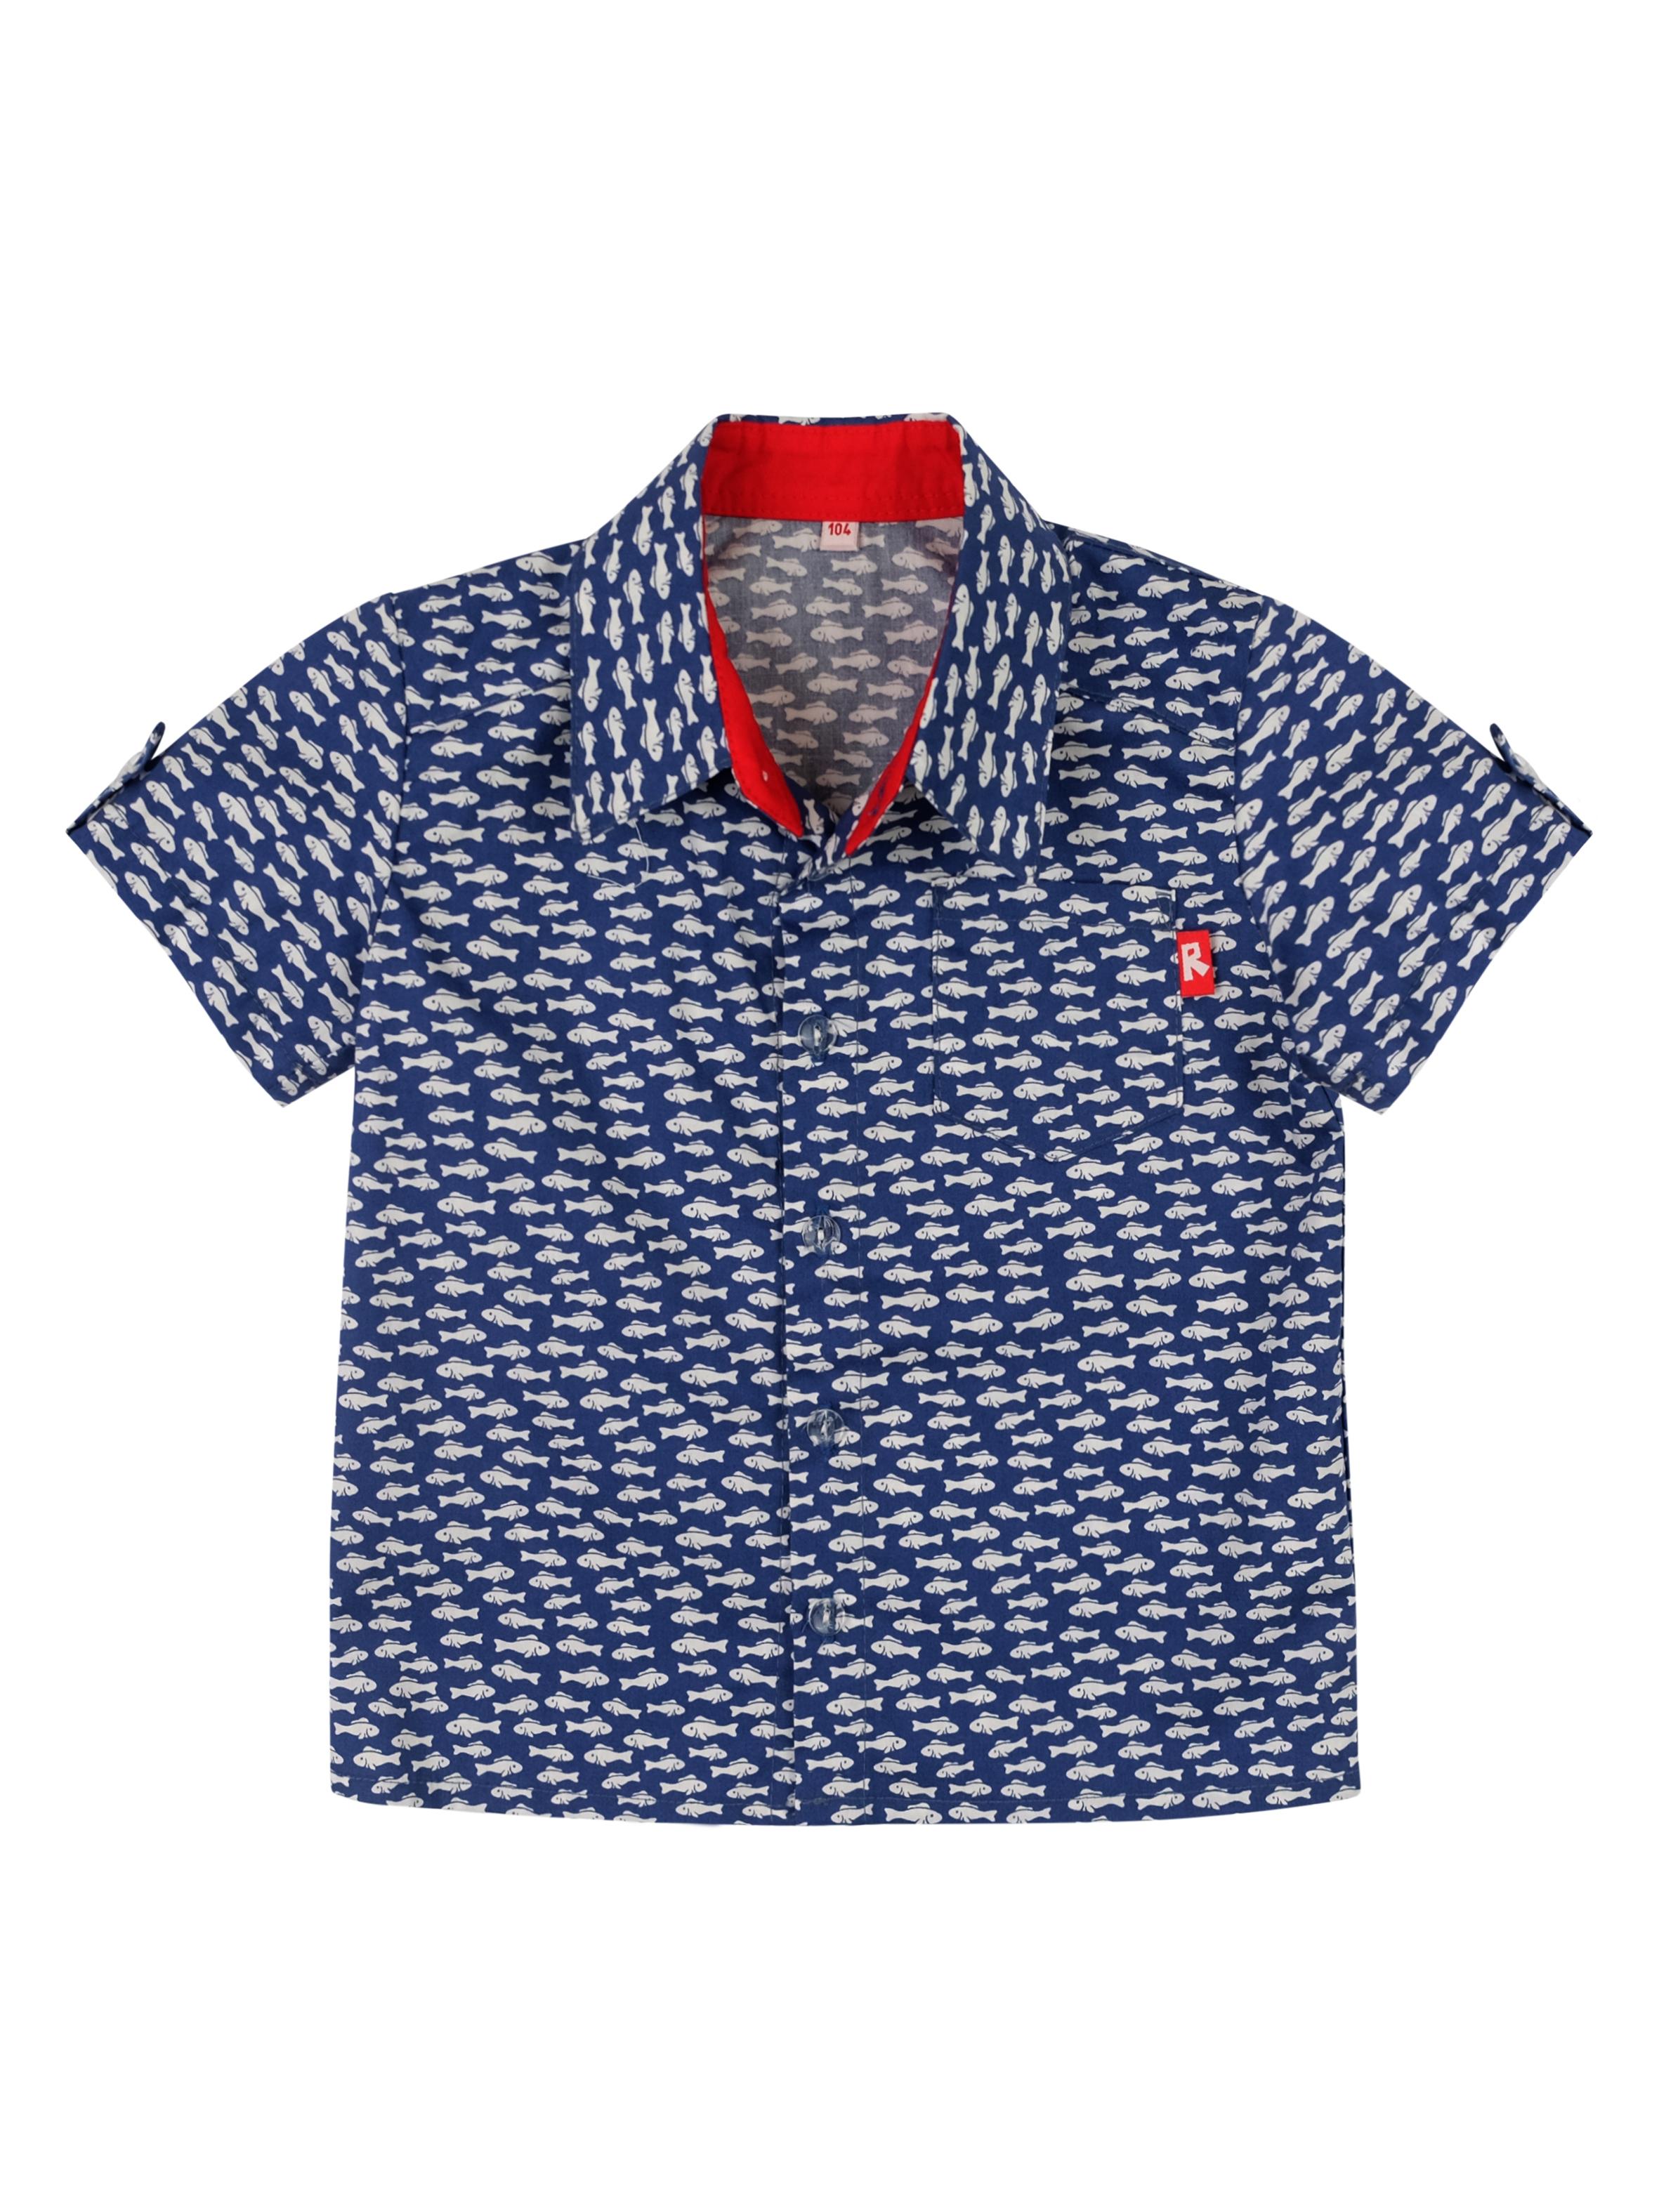 Рубашка для мальчика Reike синяя, RKS012SS20MRN navy, 92-52 24 мес.